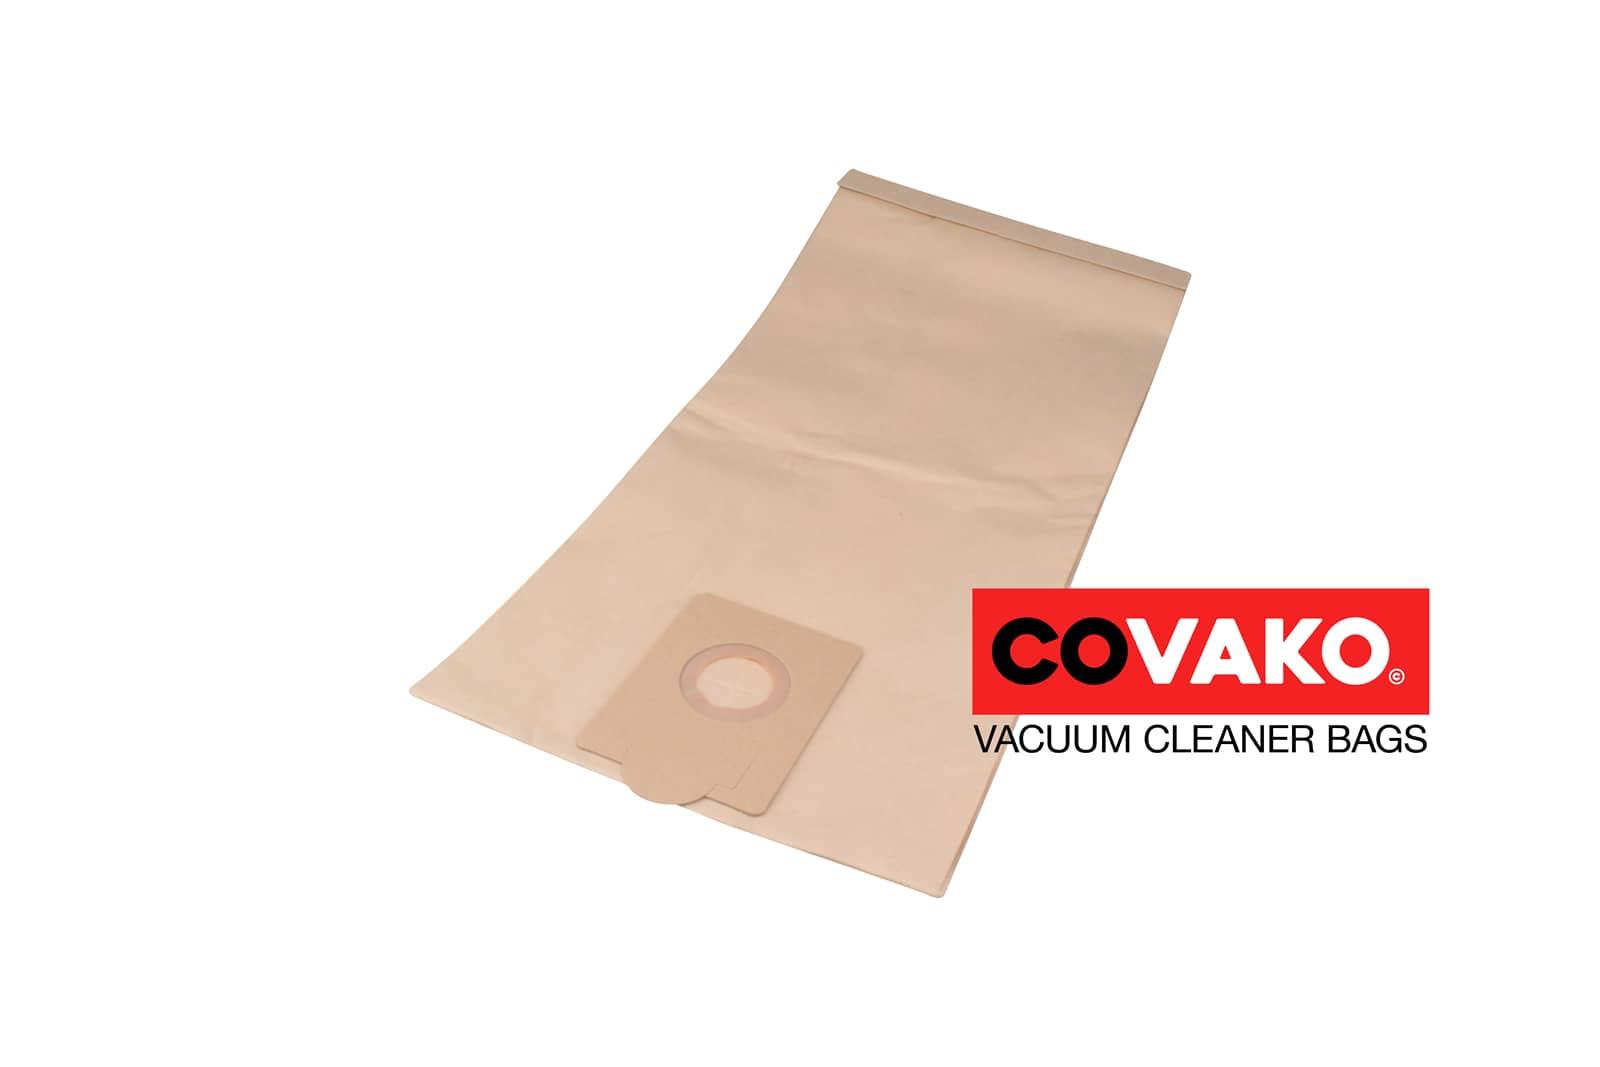 Clean a la Card K103200943 / Paper - Clean a la Card vacuum cleaner bags